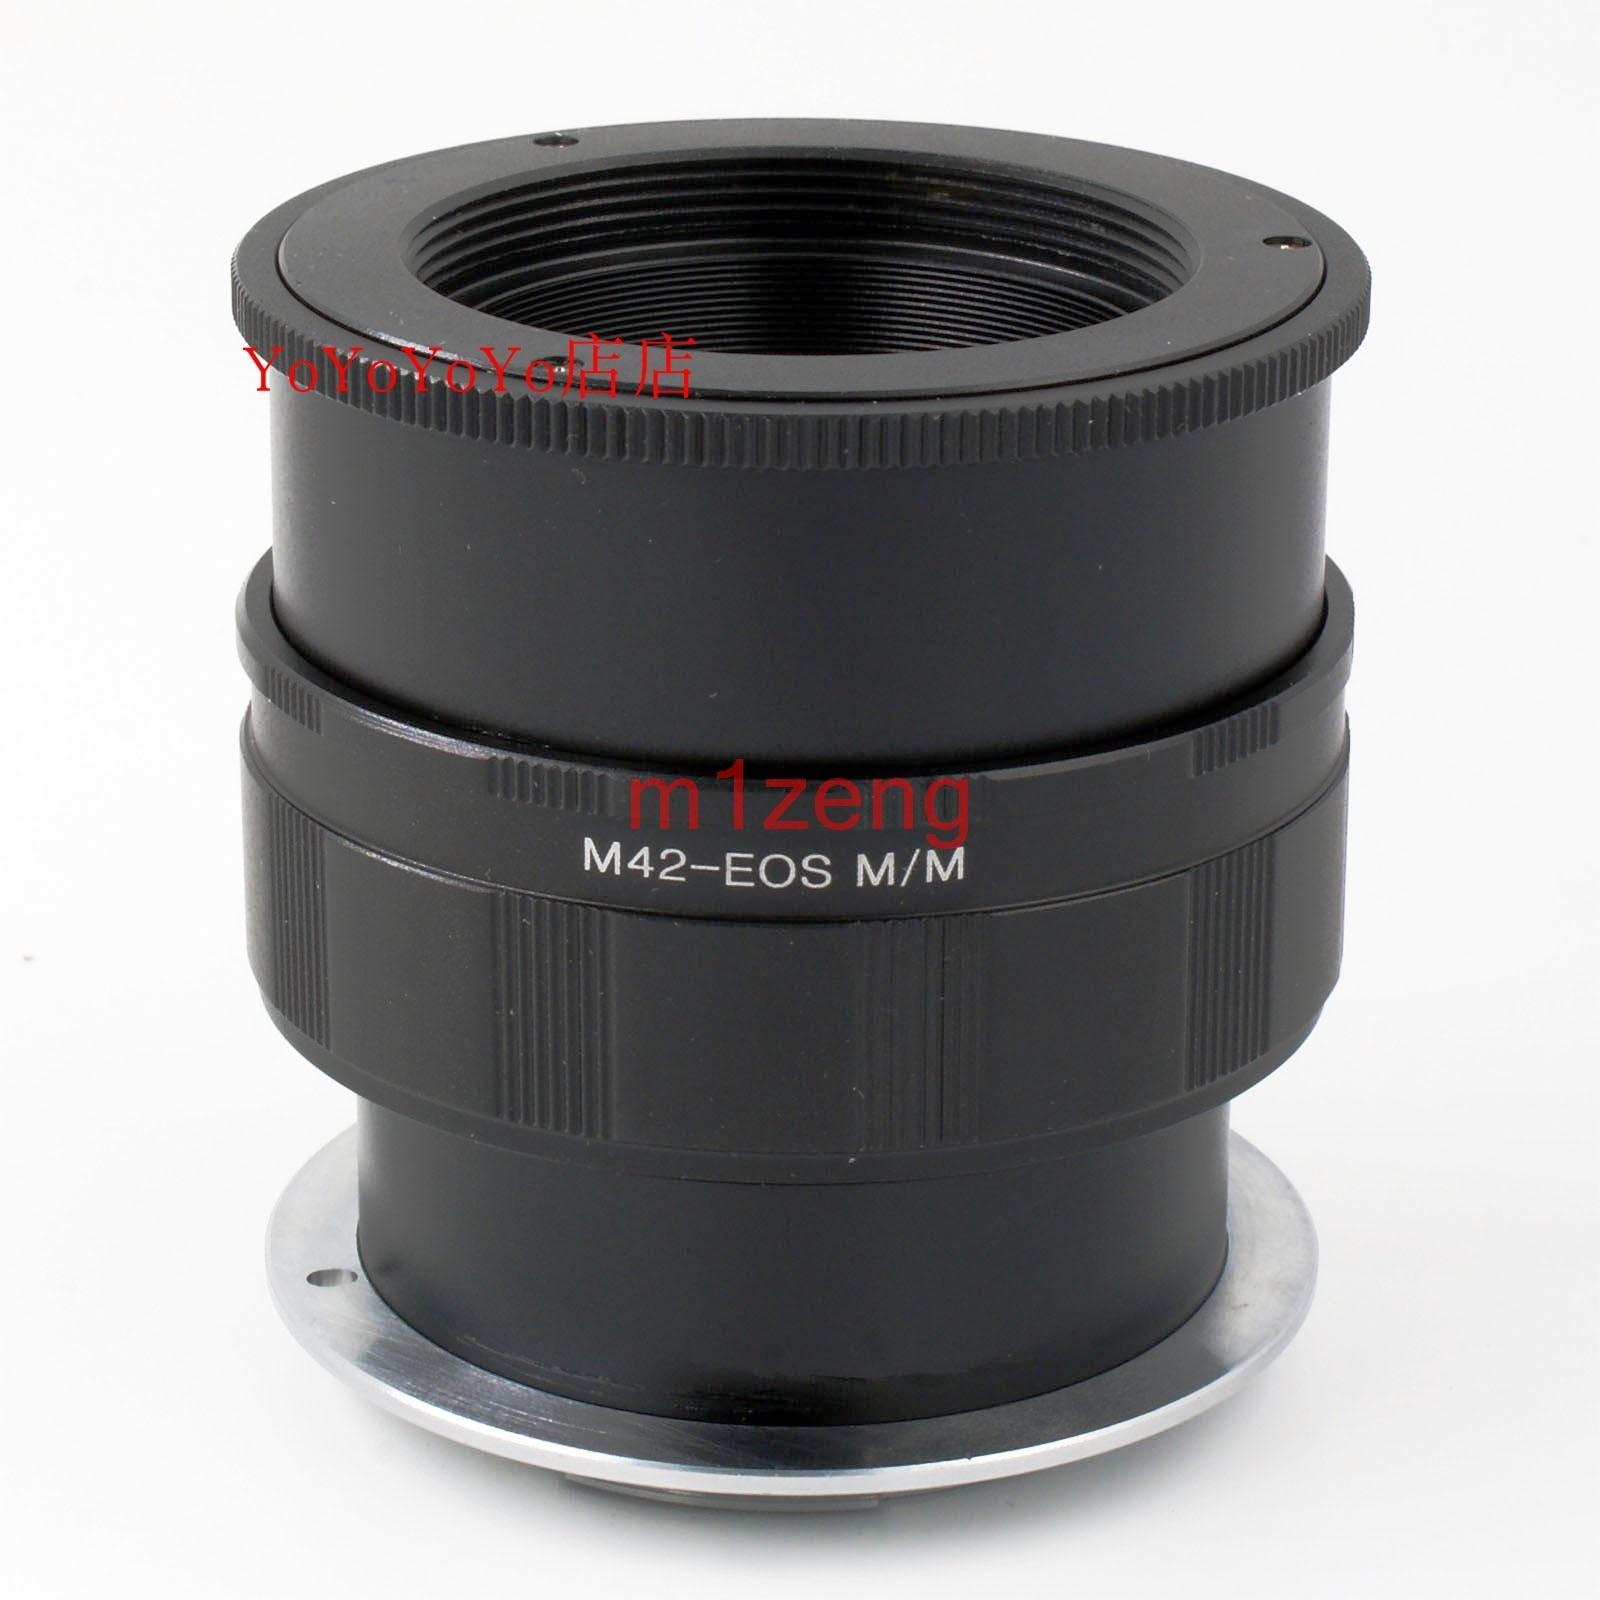 M42-EOSM ماكرو التركيز شبيه الحلزون محول الدائري ل M42 42 مللي متر عدسة ل كانون ef-m EOSM/M2/M3/M5/m6/M10/m50 المرايا كاميرا